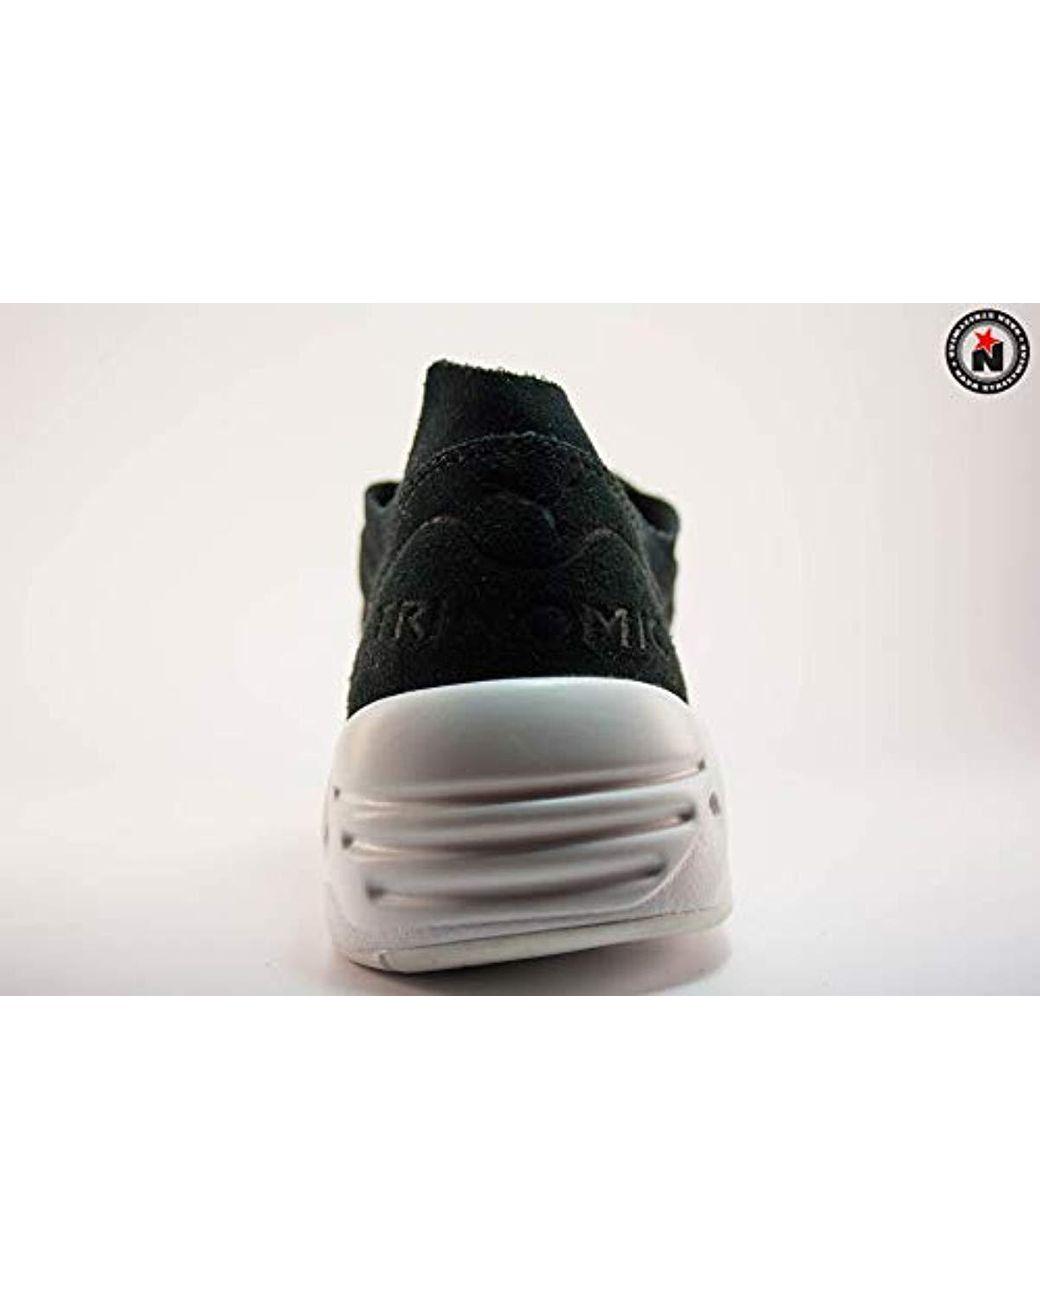 tout neuf b3feb 219b4 PUMA Ftrack R698 Soft Pack, Unisex Adults' Low-top Sneakers ...